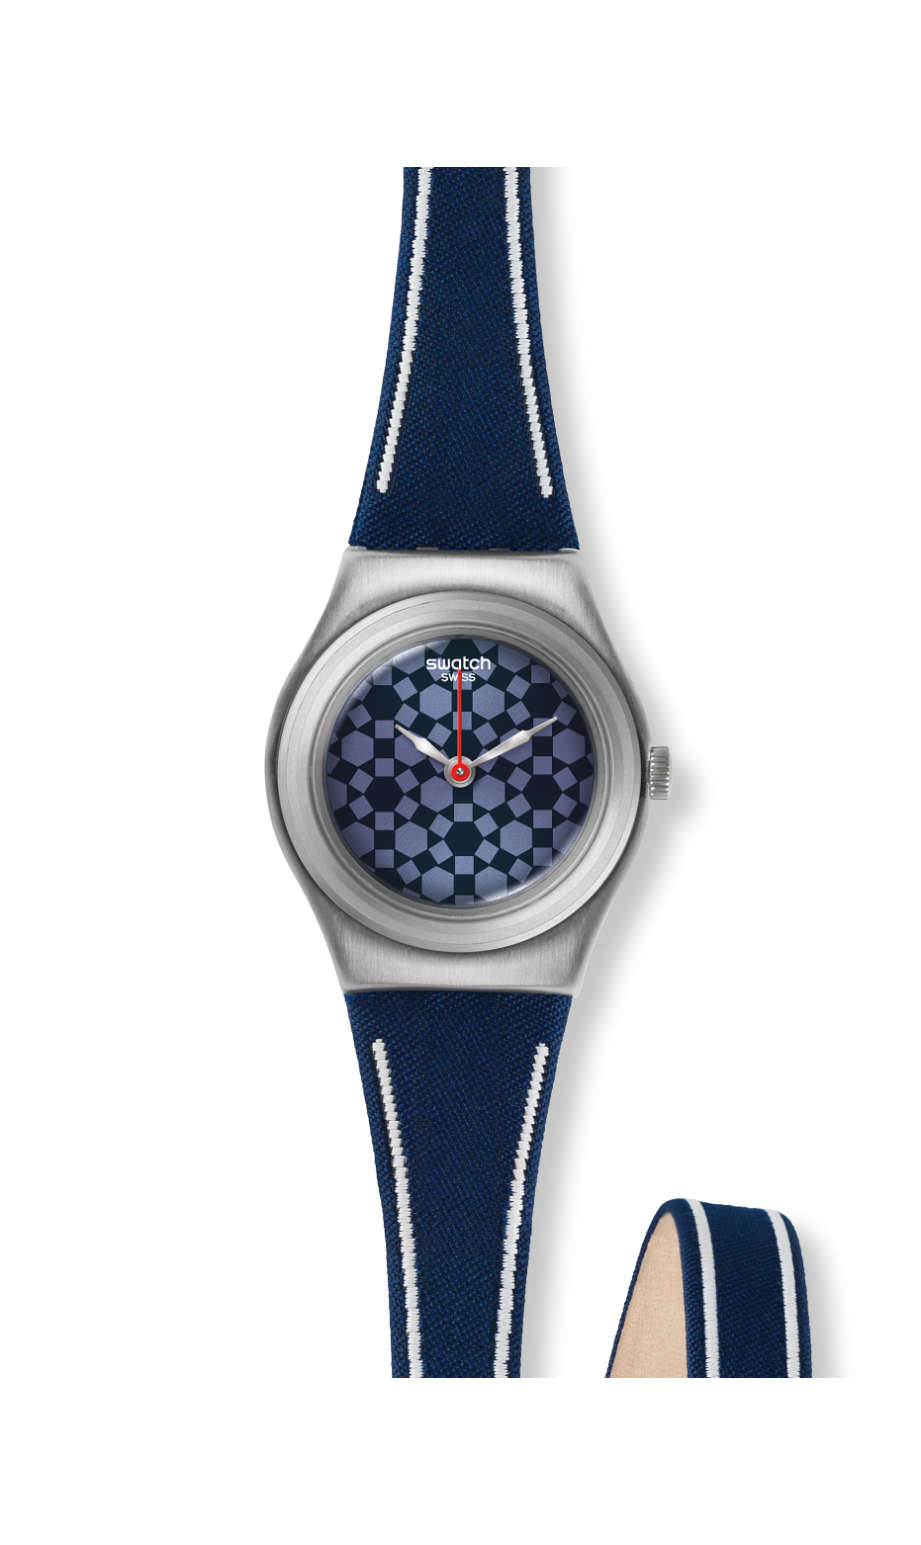 Swatch - BLUE STREET WRIST - 1